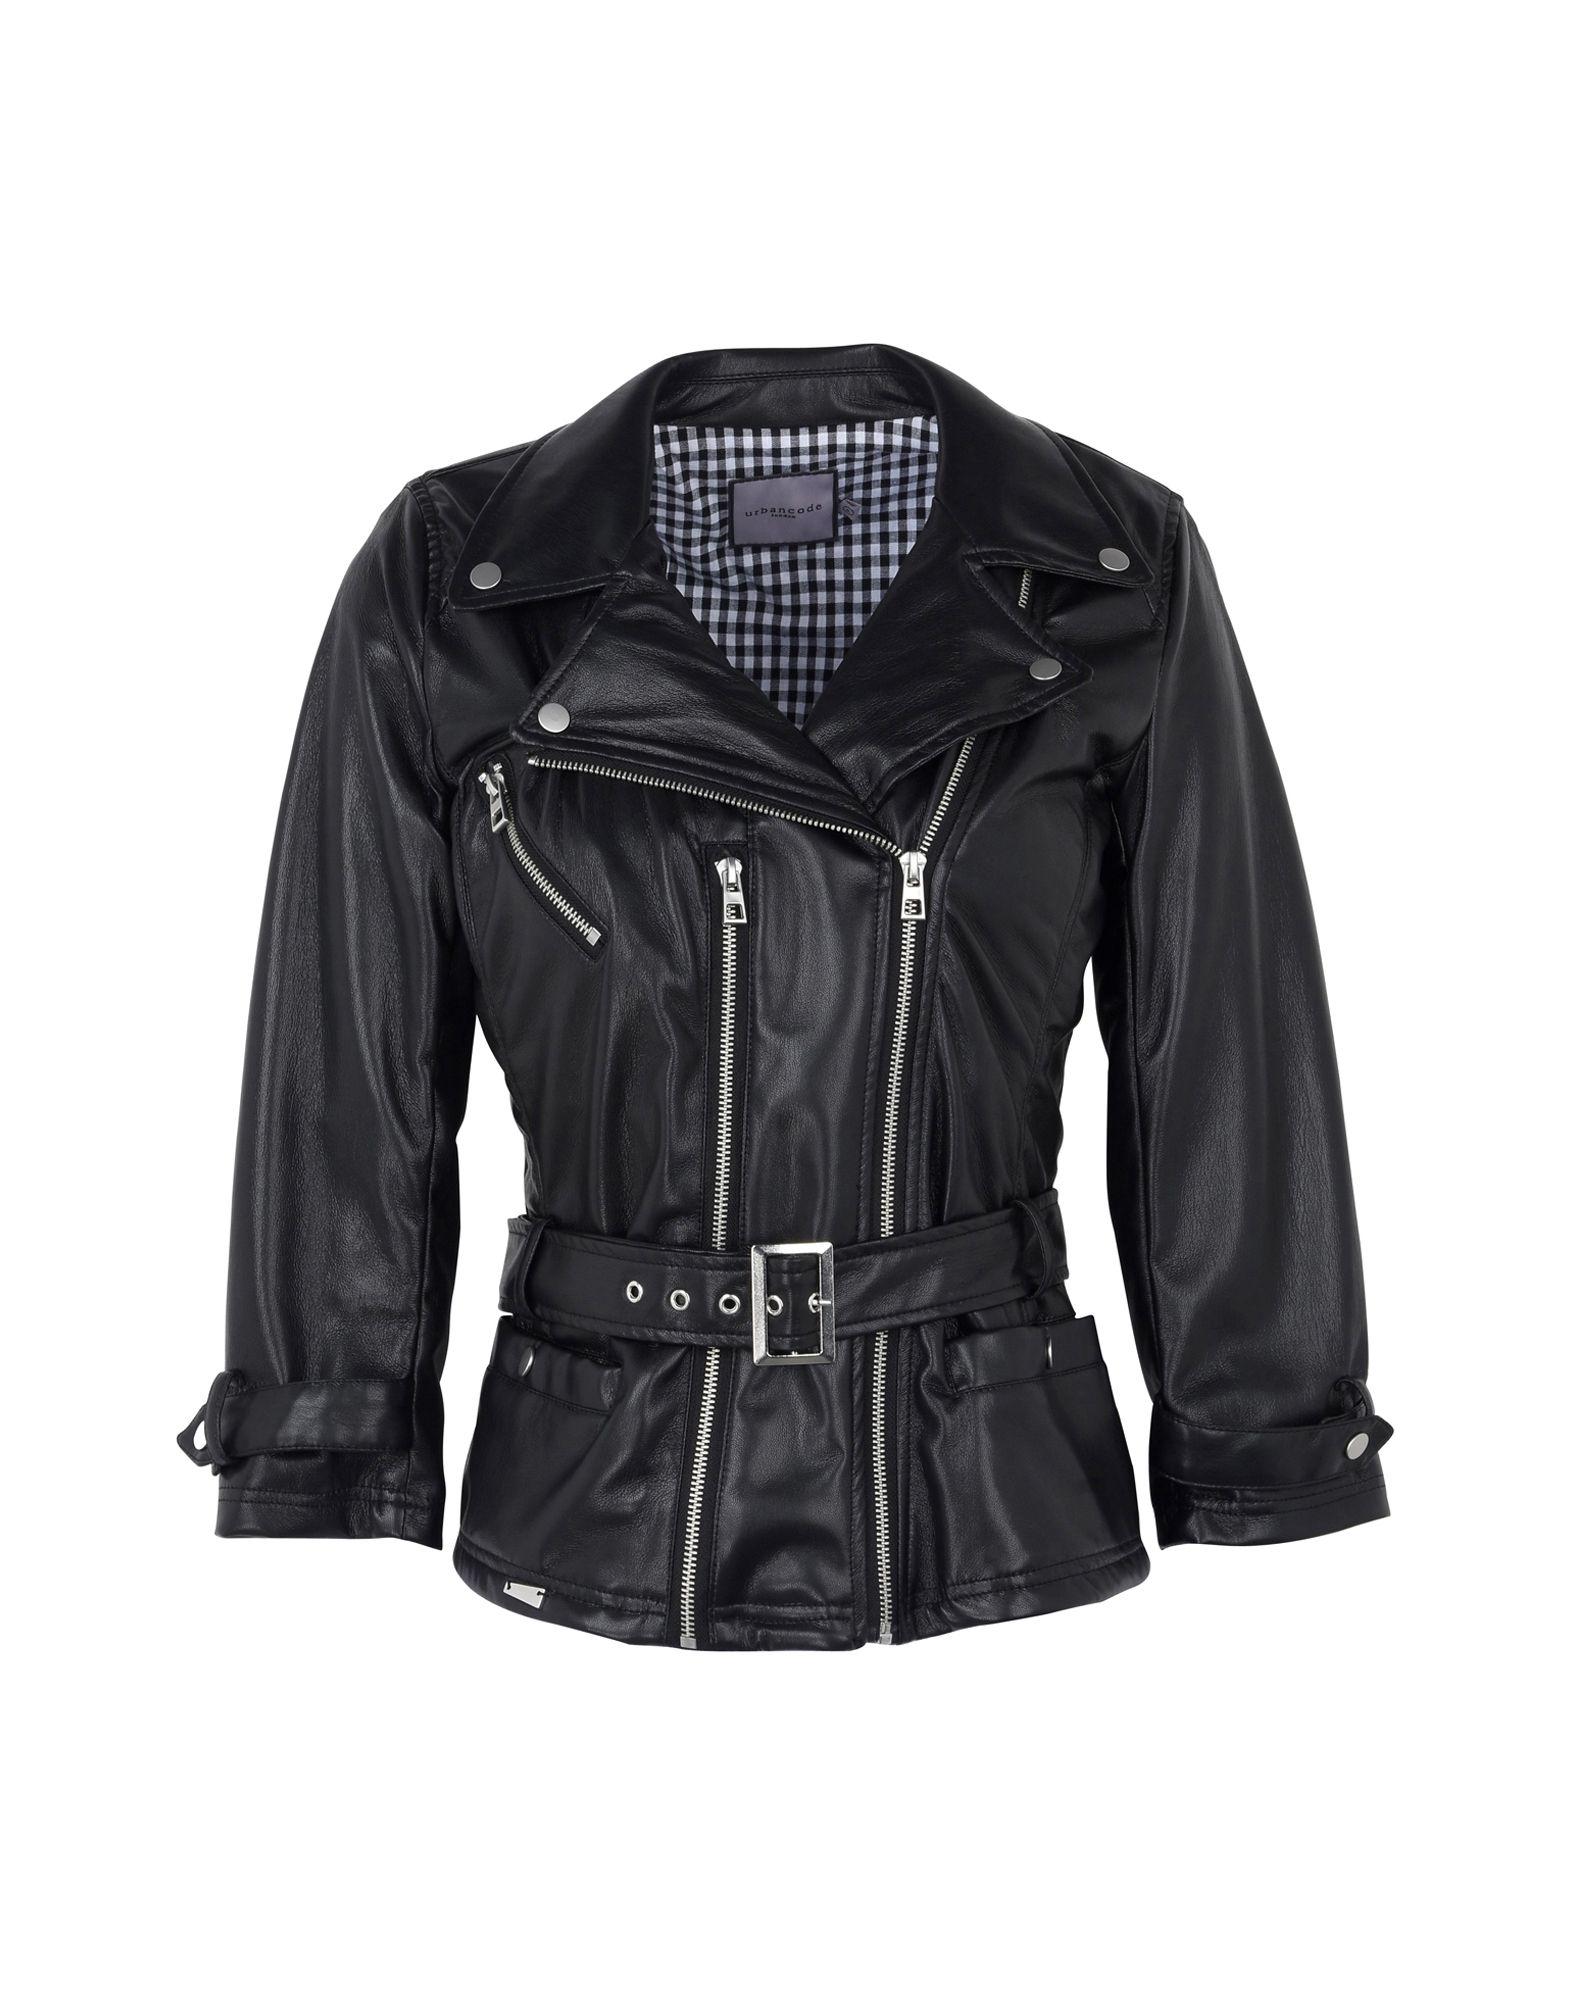 URBANCODE Jackets in Black